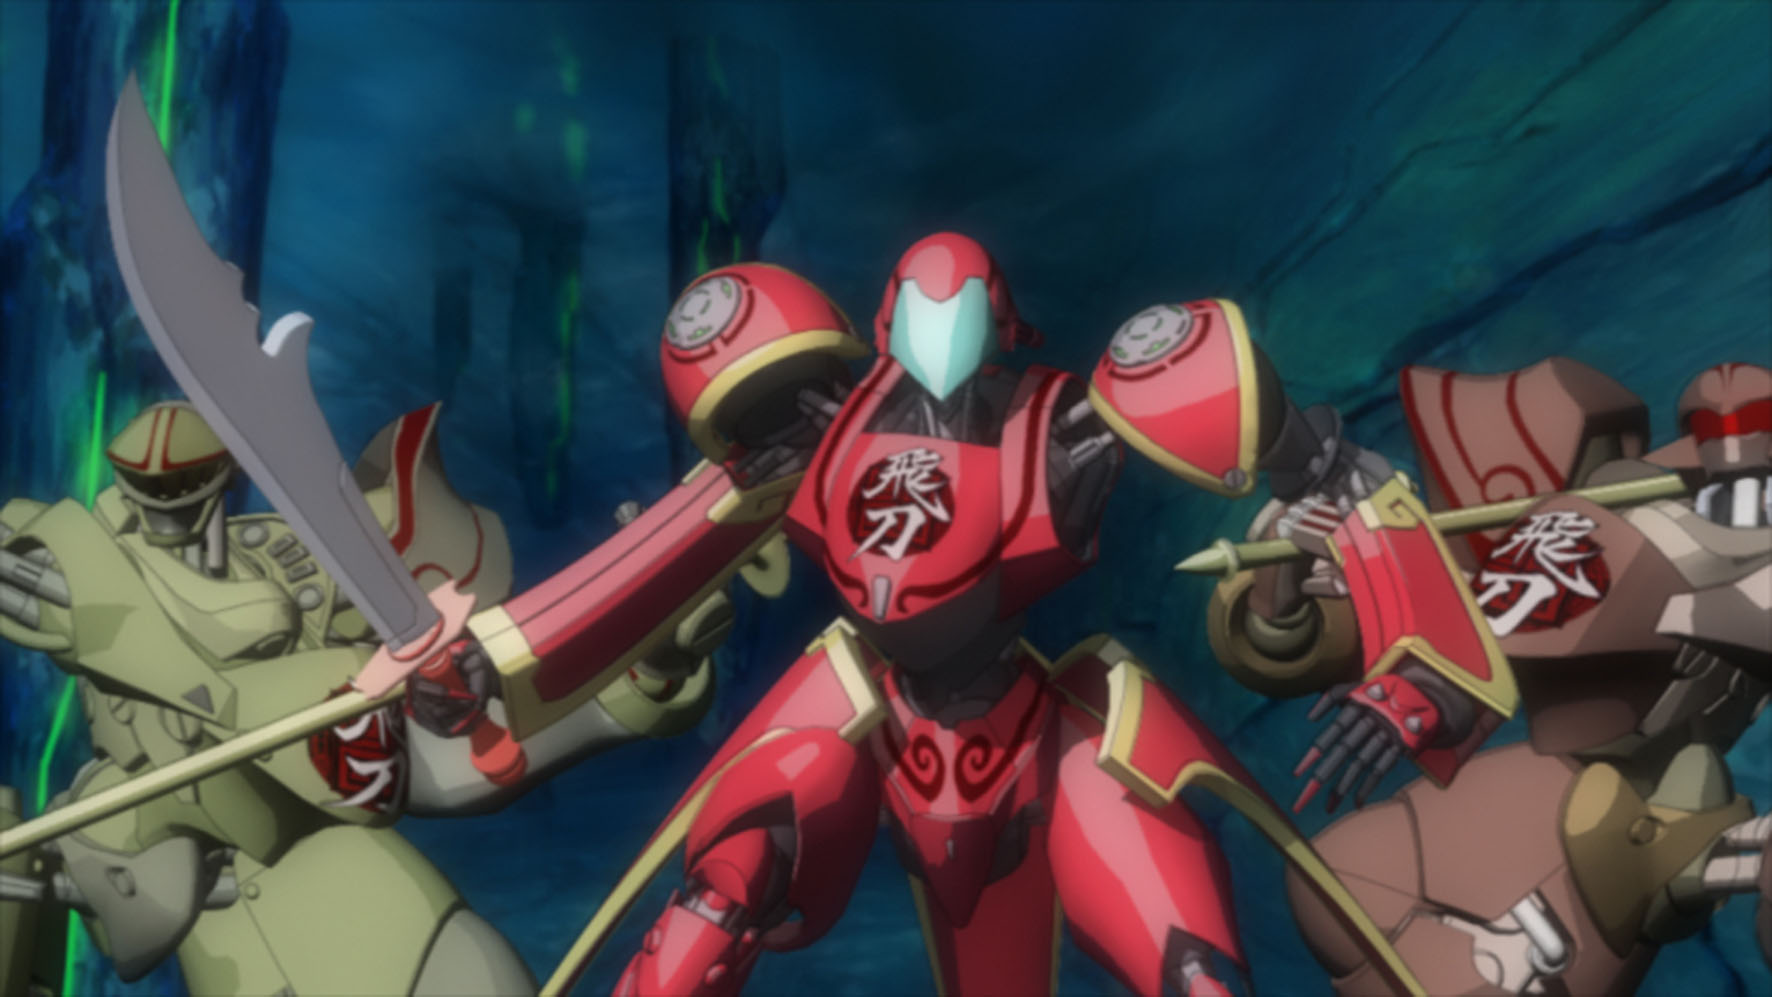 Irregular Reconnaissance: Anime #7